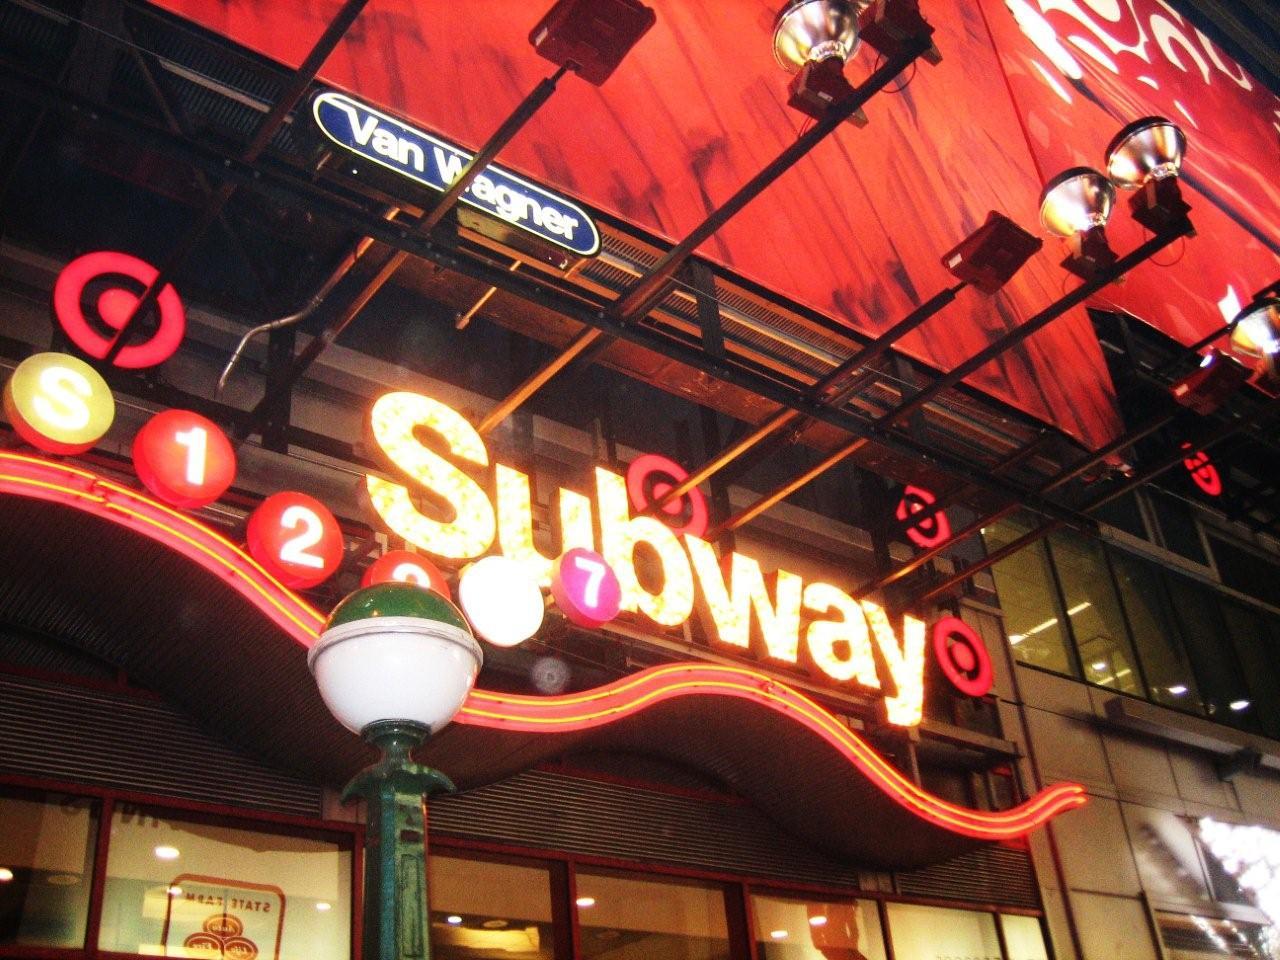 地下鉄の看板、派手ッ!_f0076322_15475074.jpg